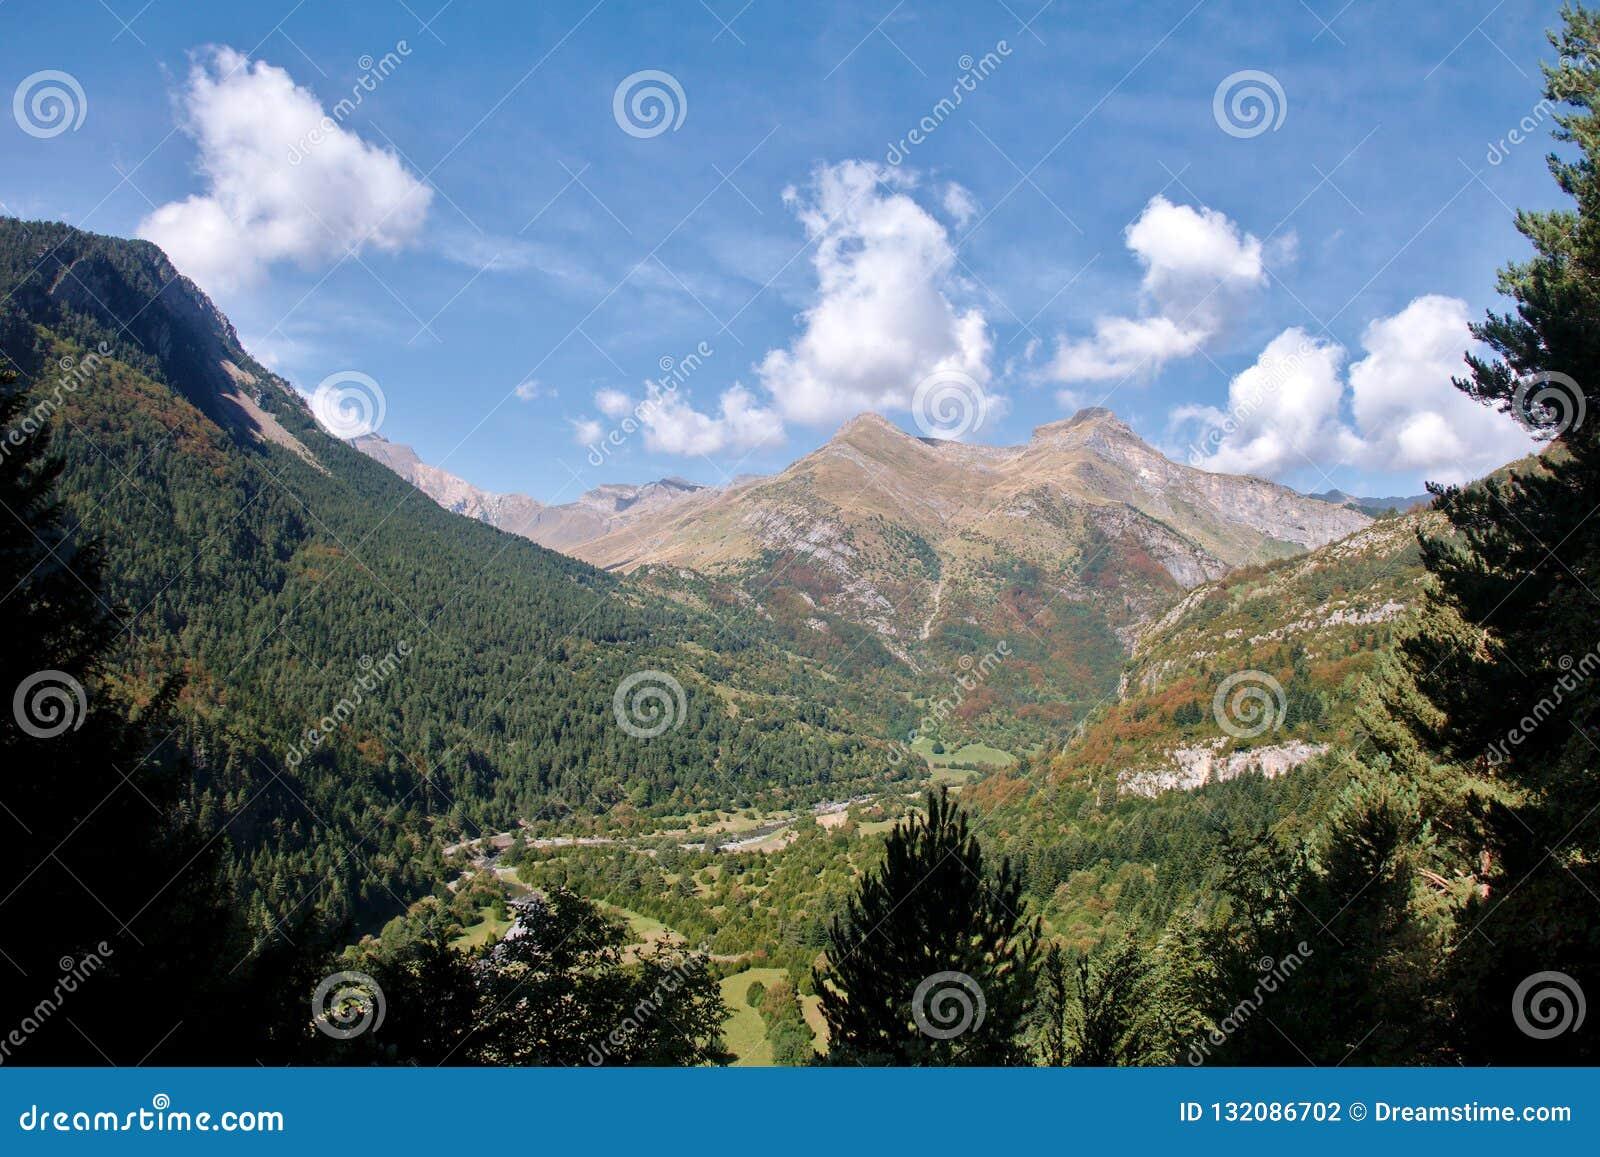 Vale spain france pyrenees de Bujaruelo